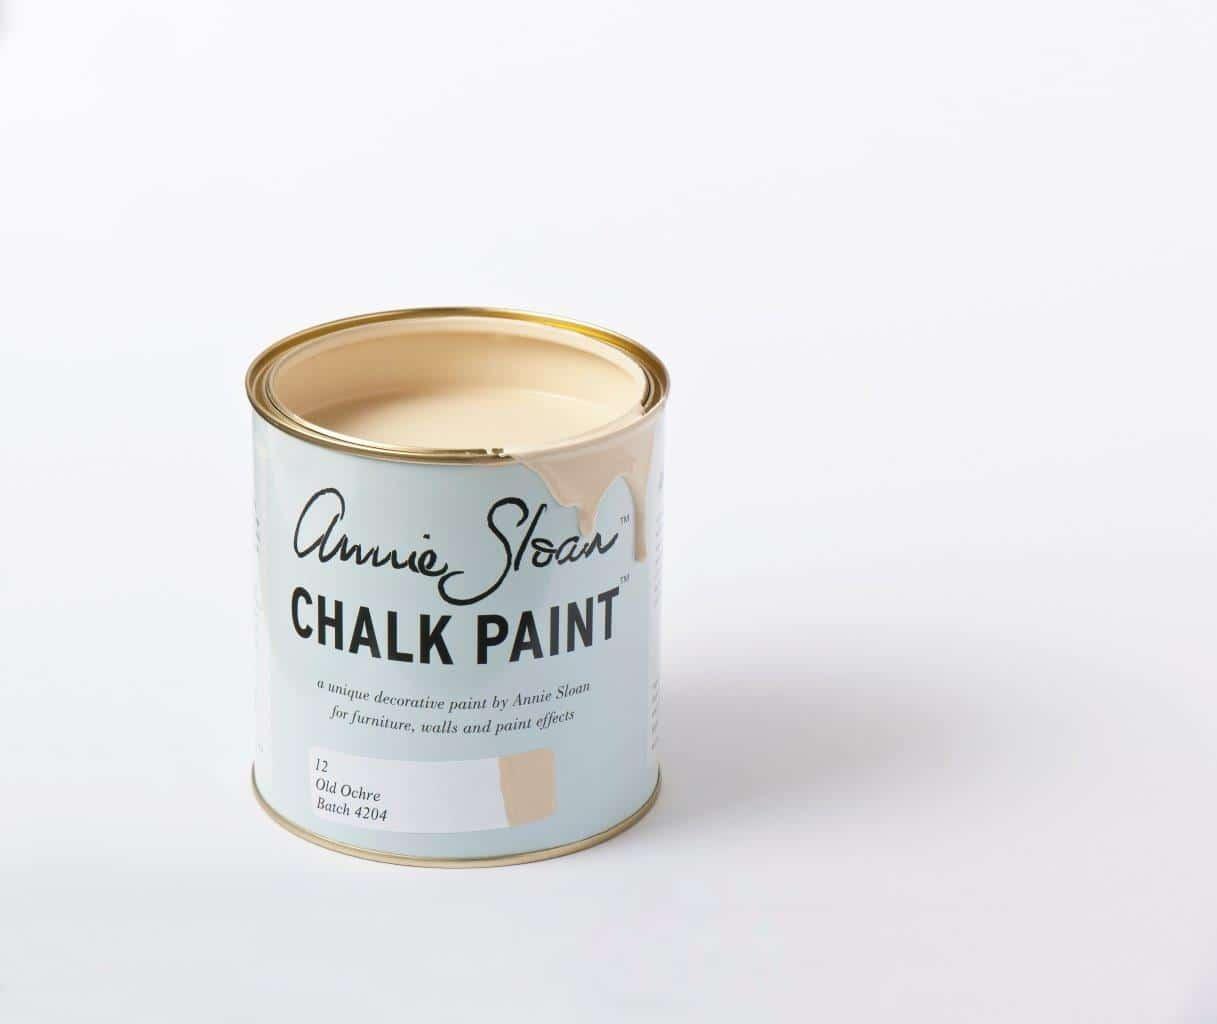 Farba do mebli Annie Sloan kolor Old Ochre